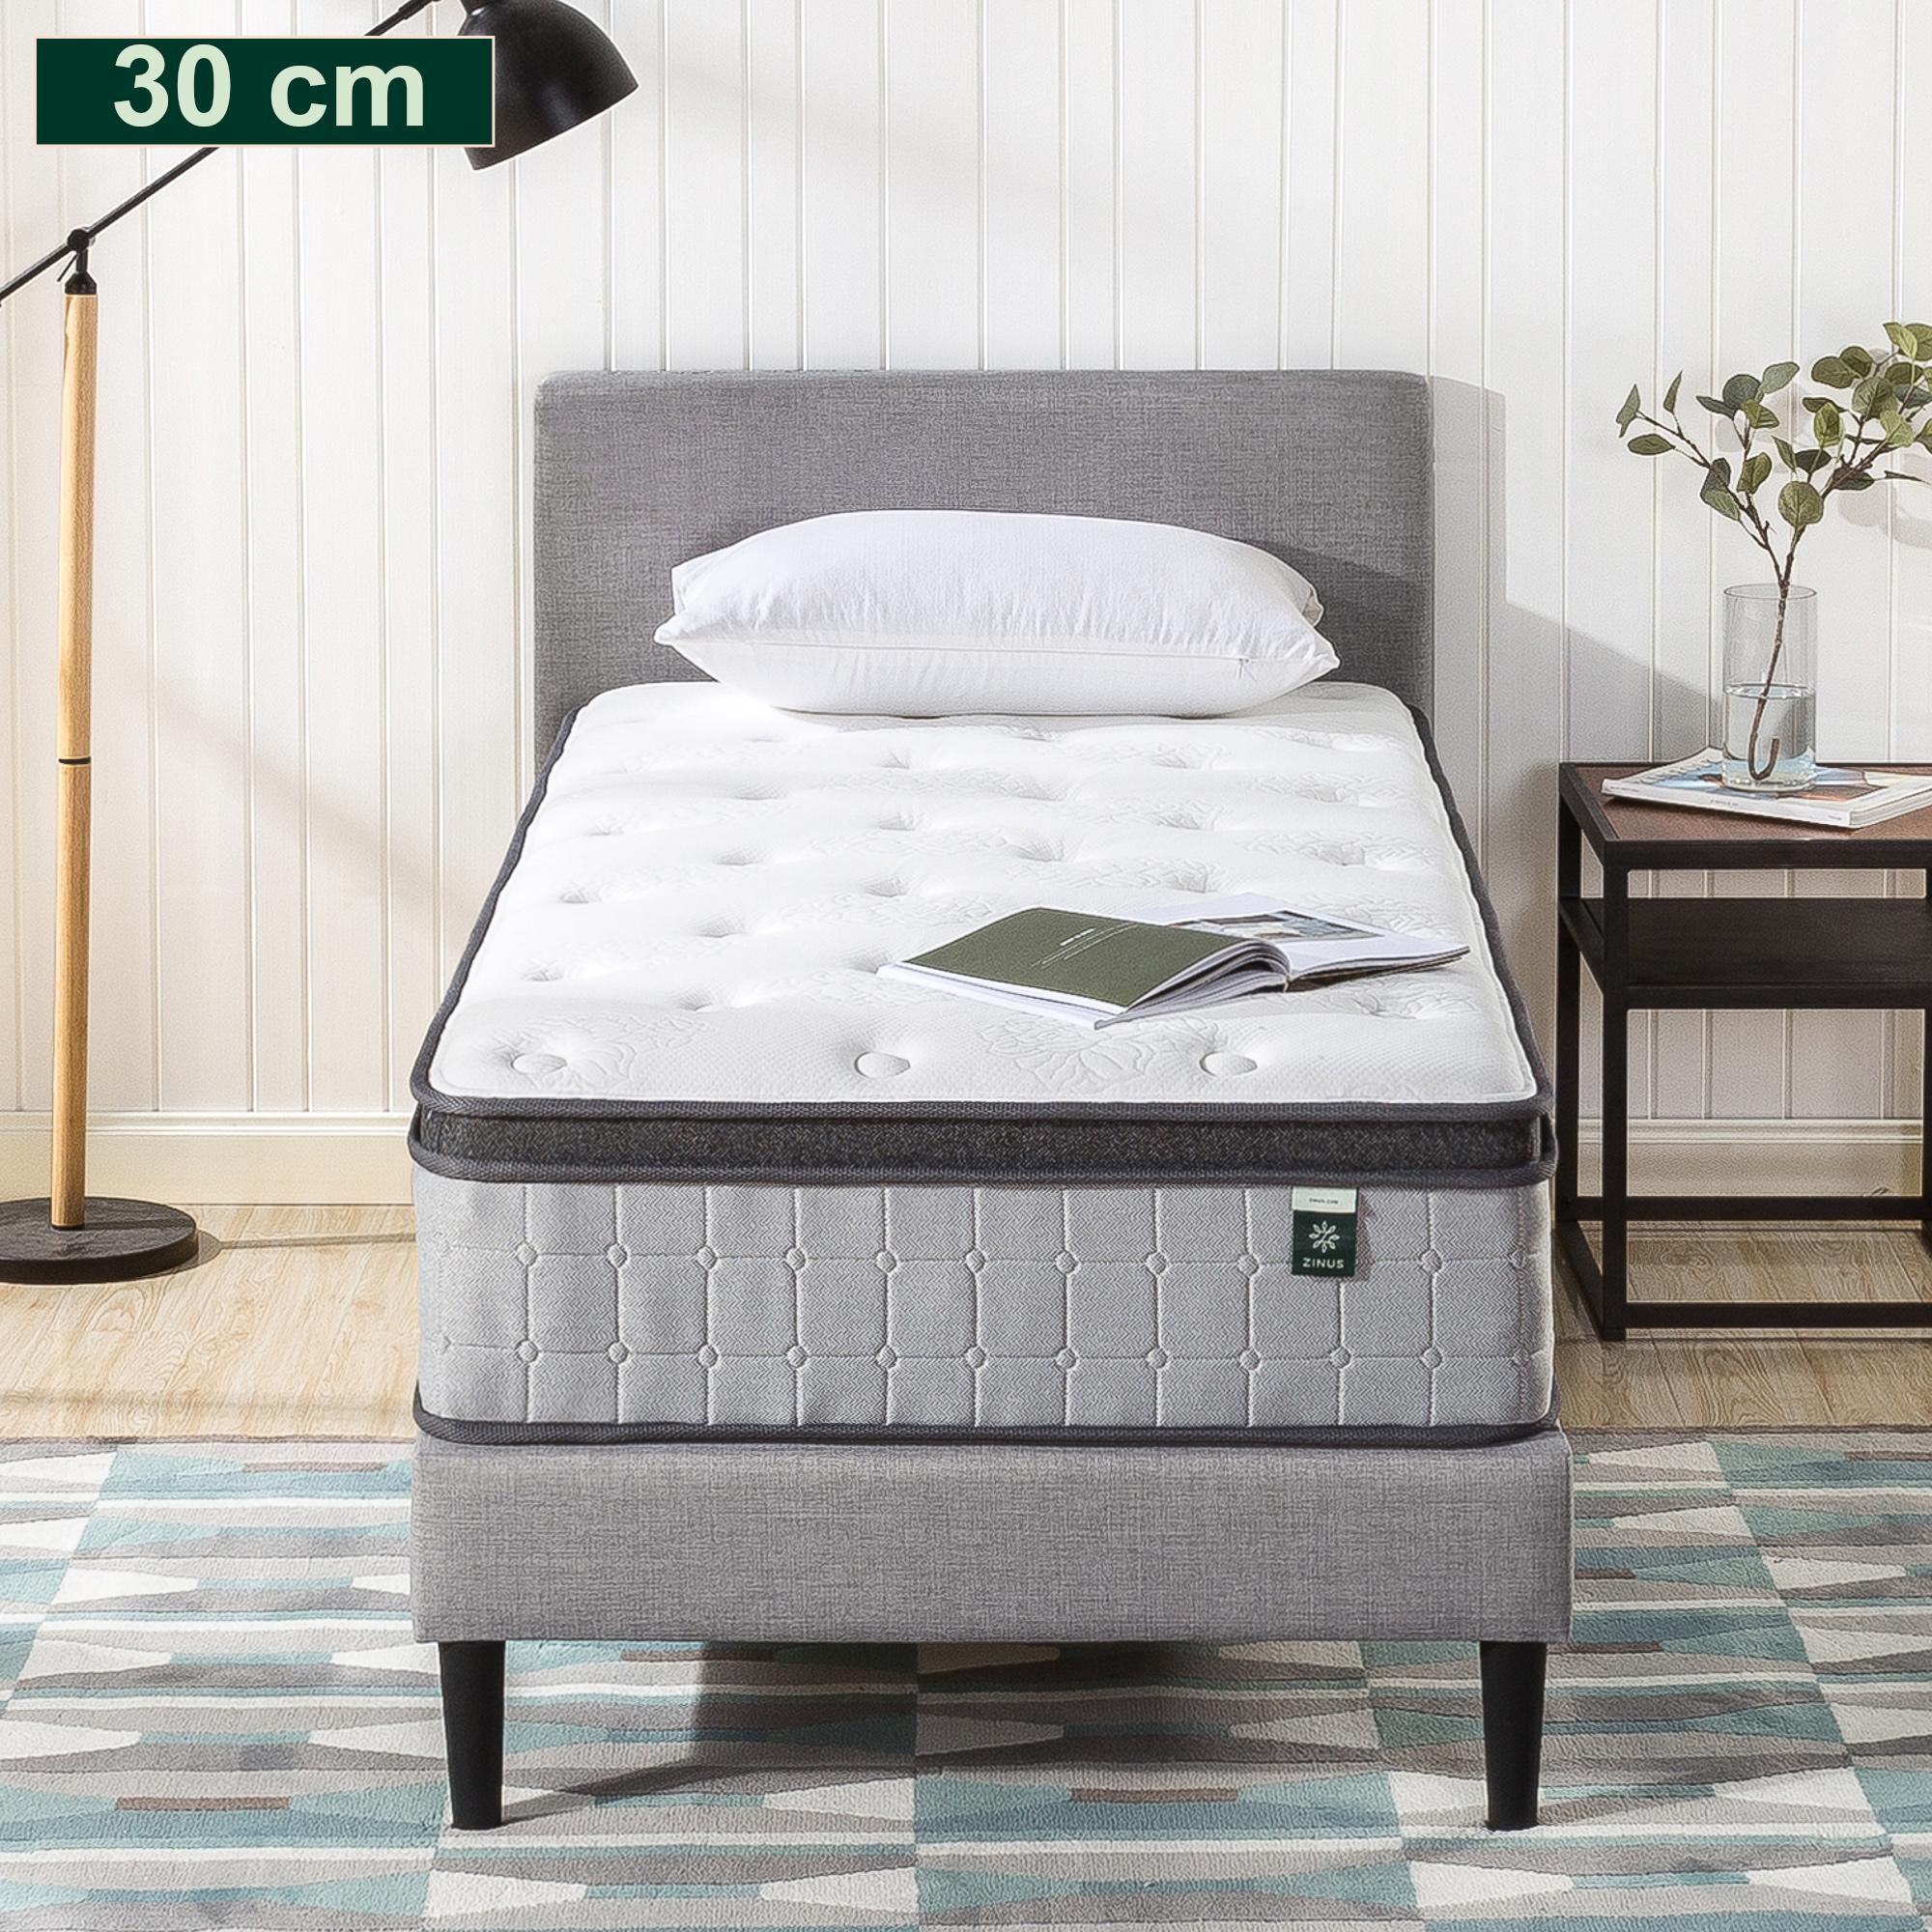 thumbnail 44 - Zinus Mattress Queen Double King Single Bed Memory Foam Pocket Spring Hybrid